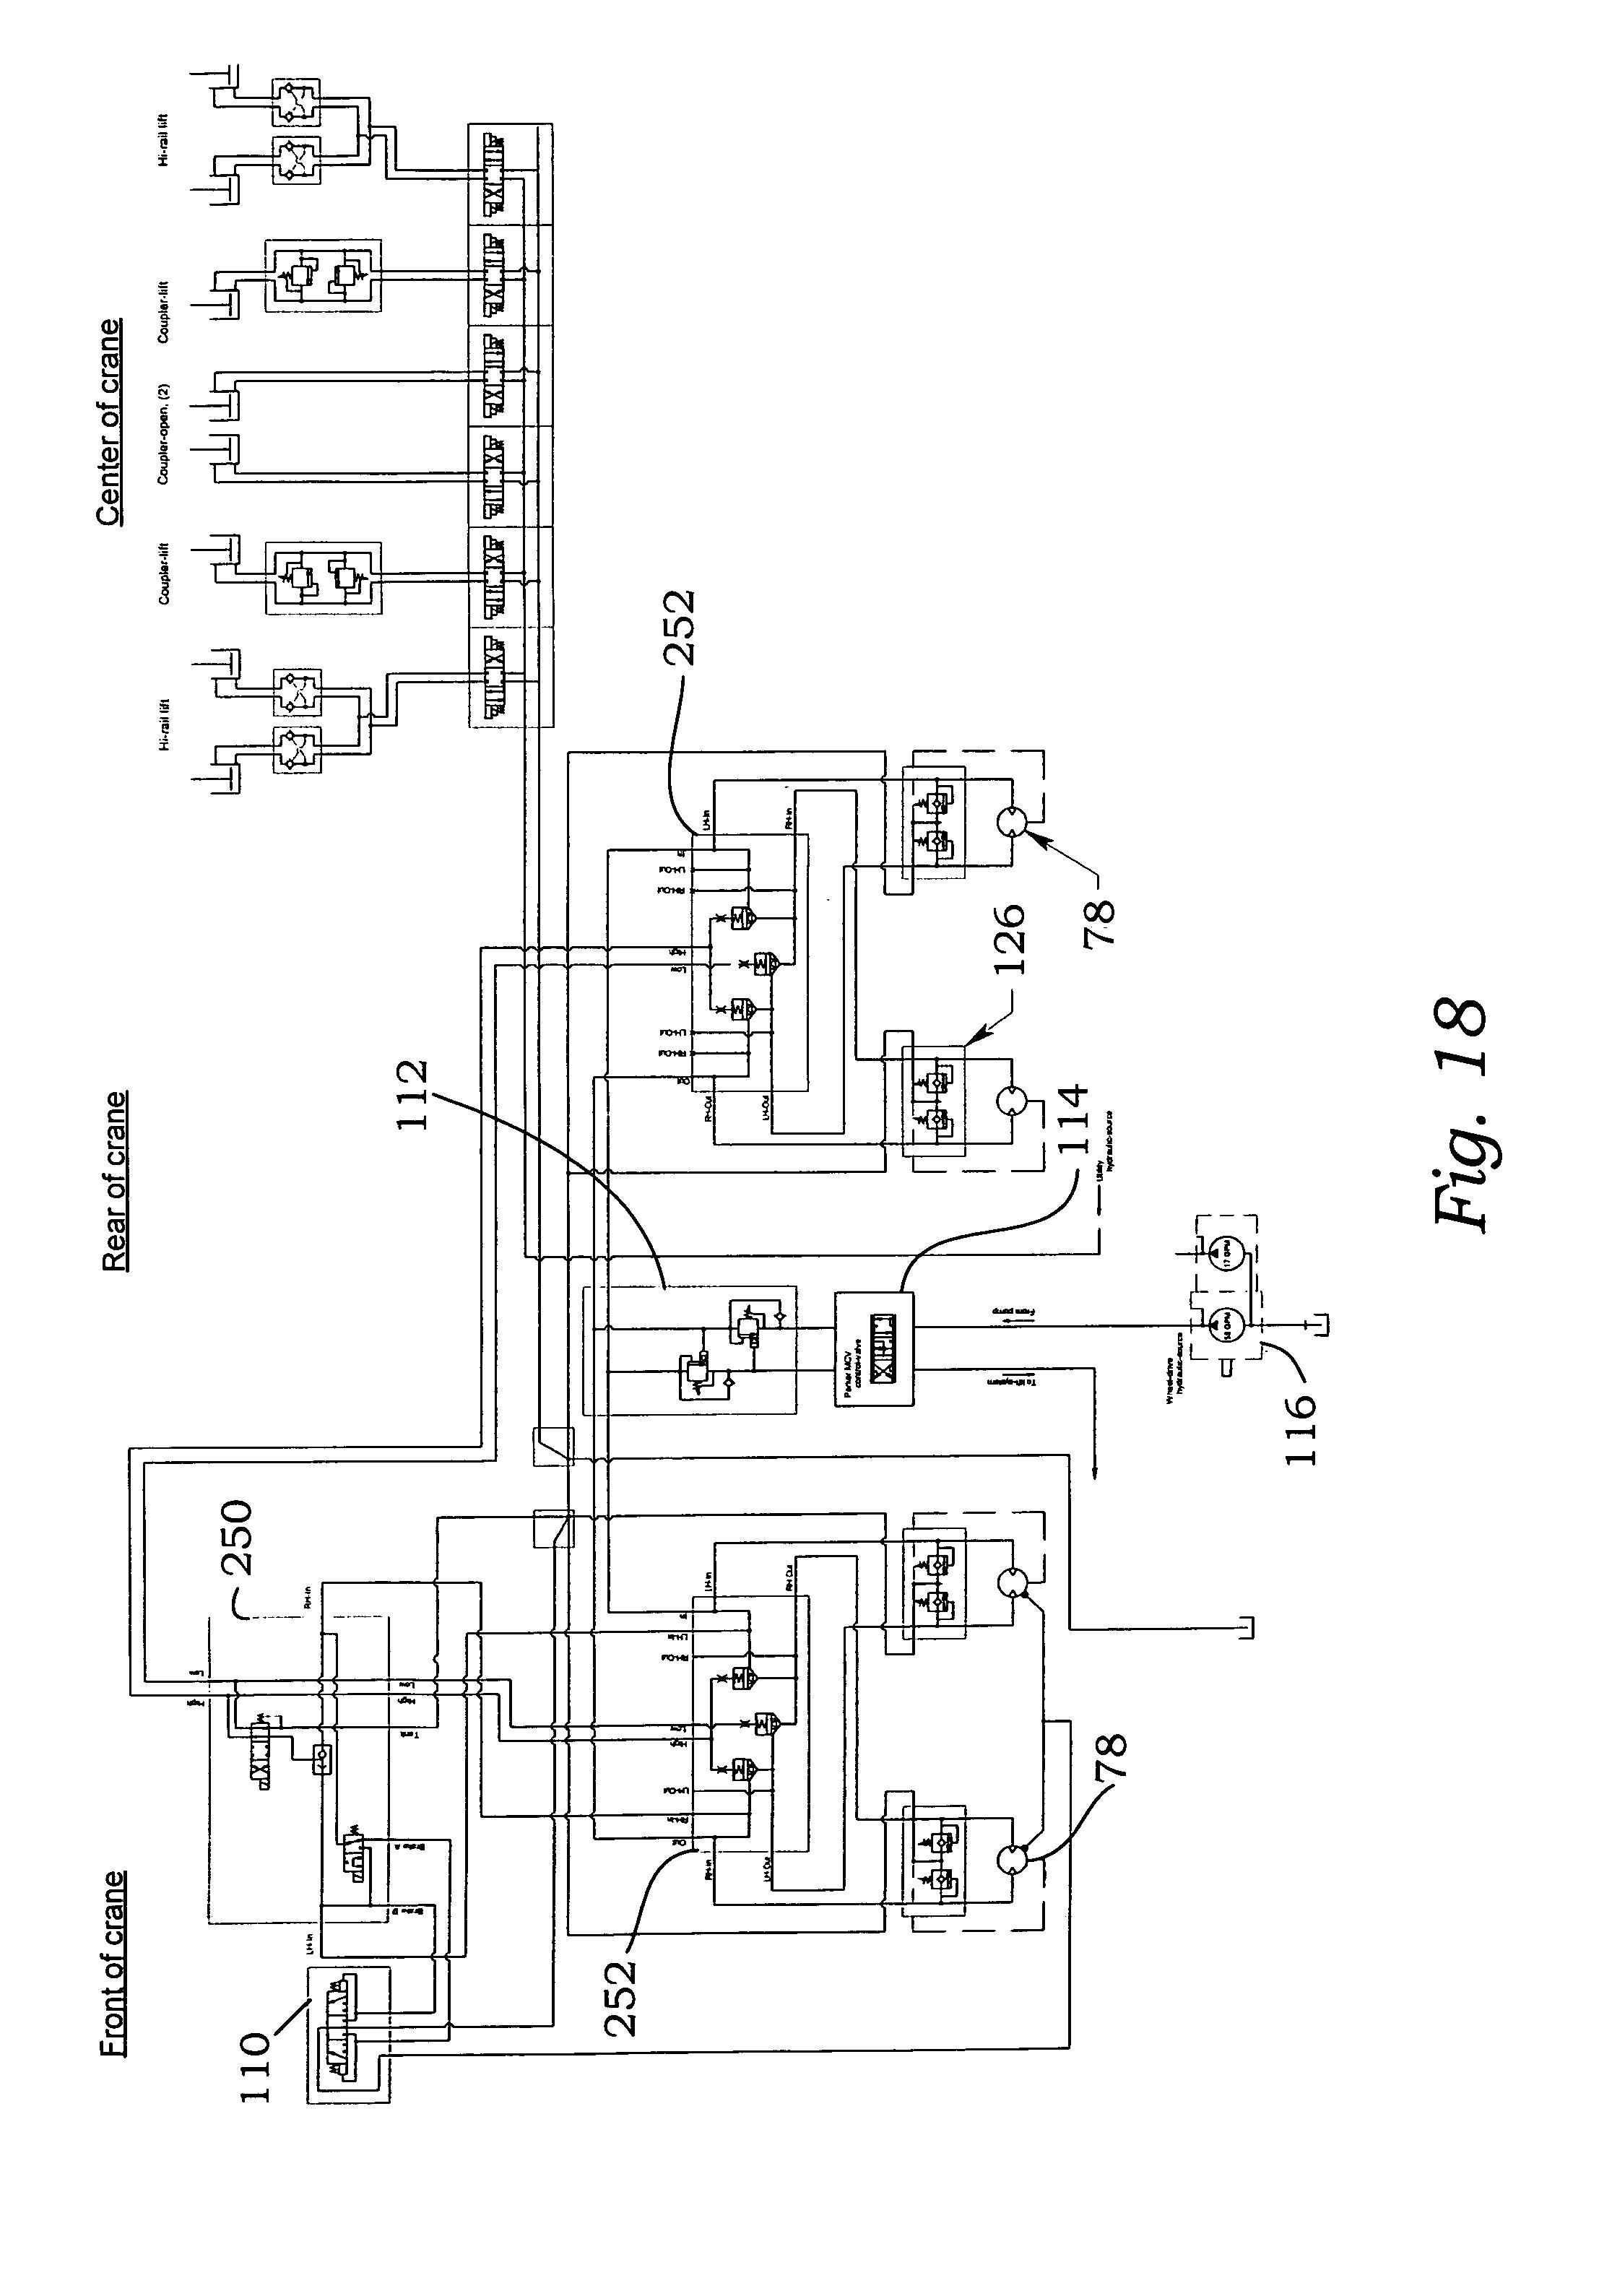 patent us7201106 - hydrostatic hi-rail system